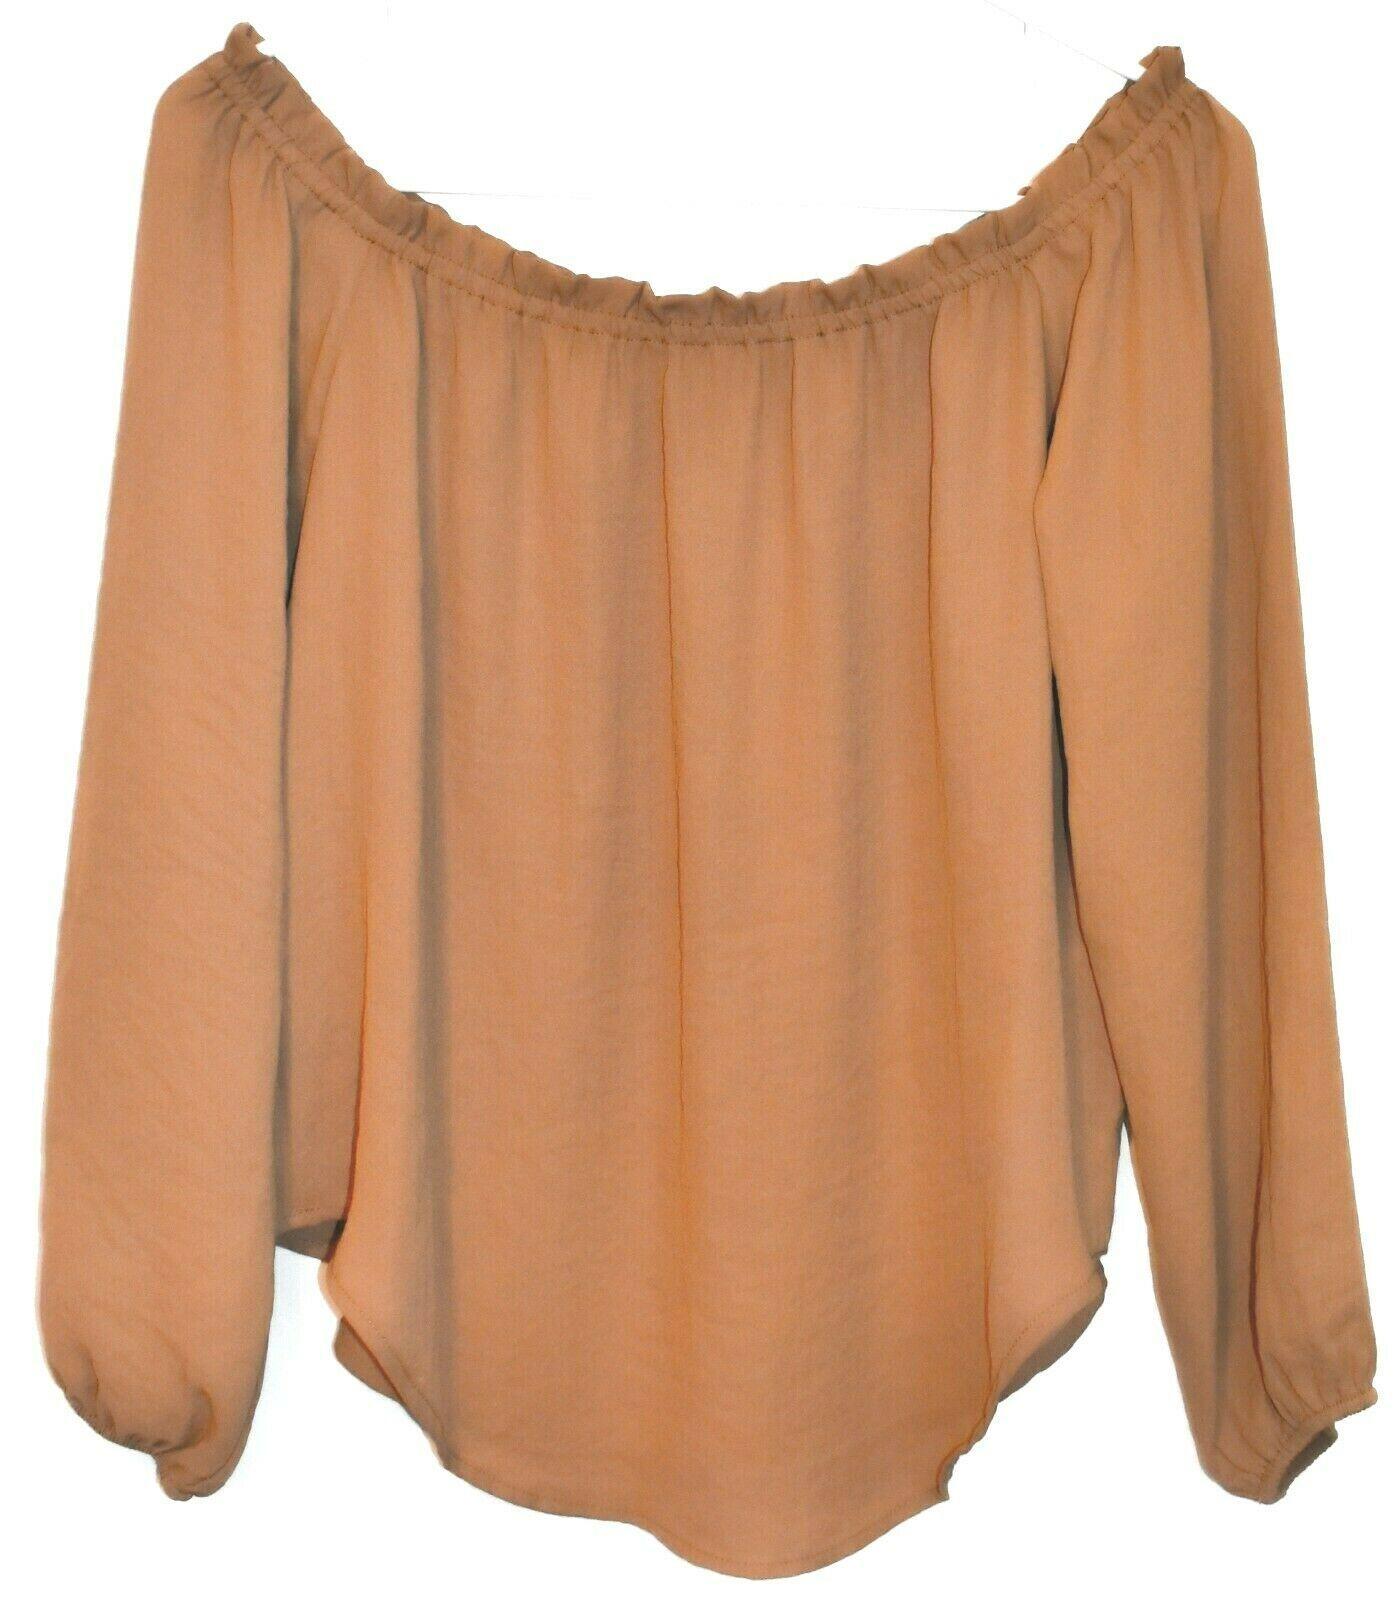 Forever 21 Women's Camel Brown Off-the-Shoulder Sheer Blouse Size S